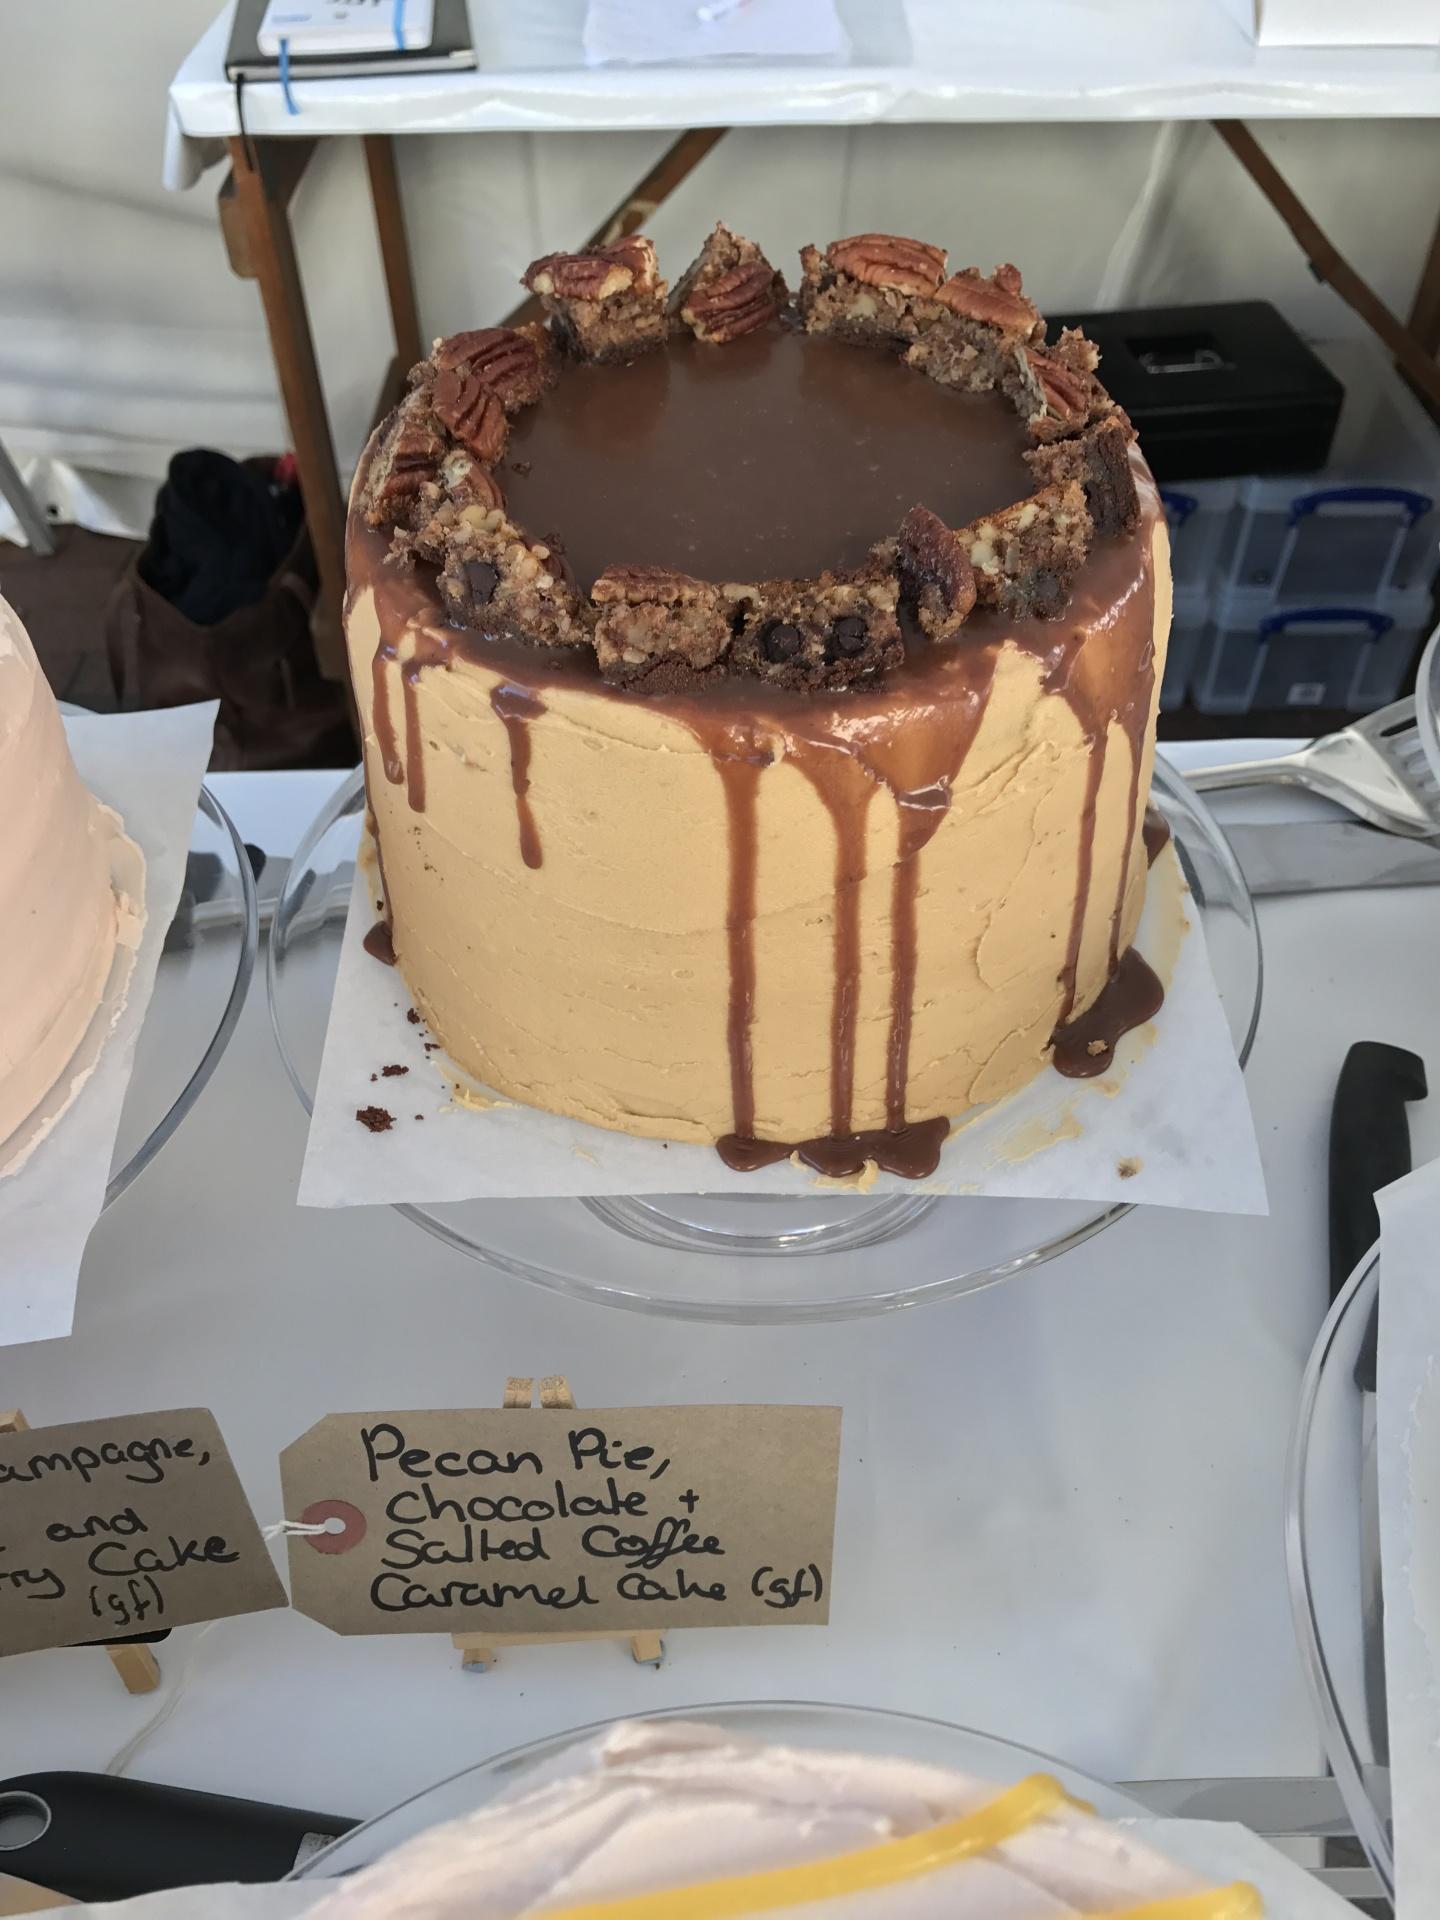 Pecan Pie, Chocolate and Salted Coffee Caramel Cake